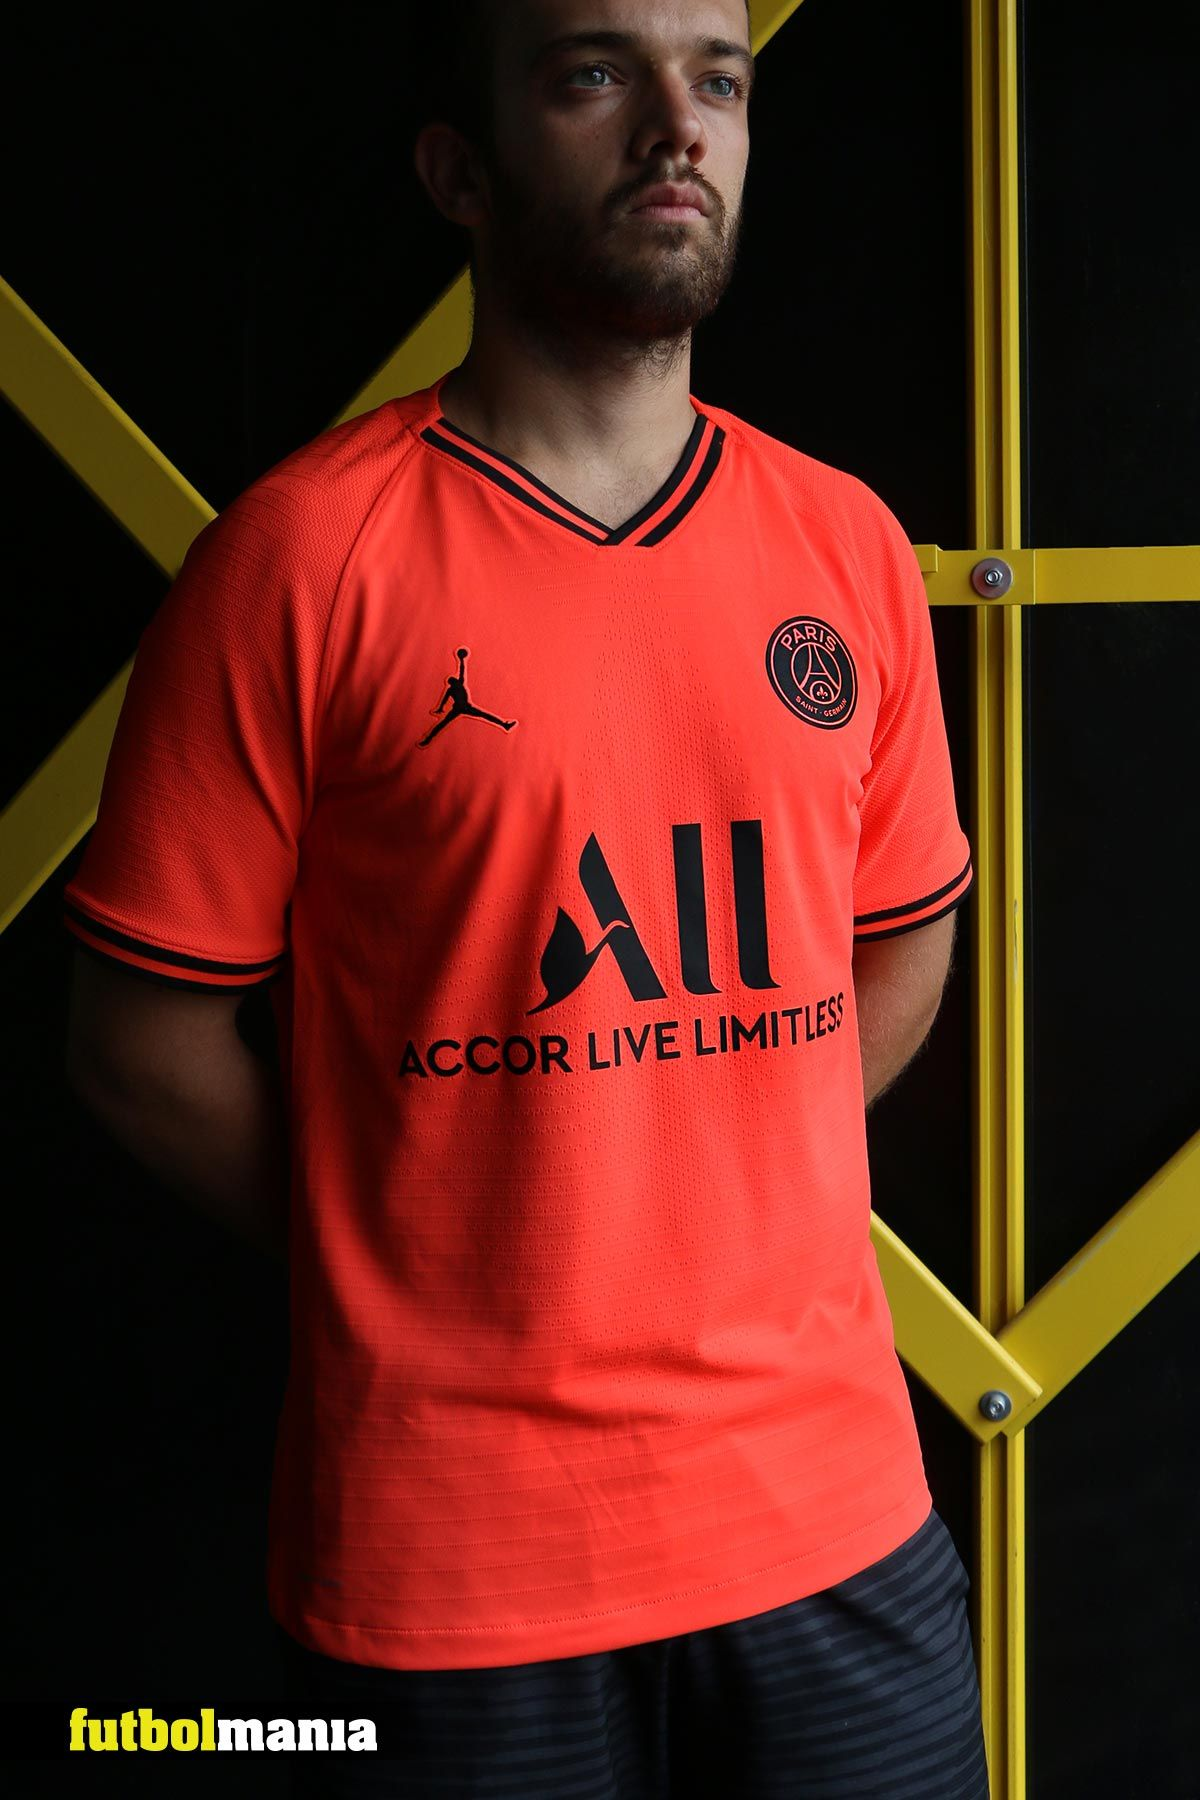 Camiseta Nike 2a PSG 2019 2020 Vapor Match | Camisetas